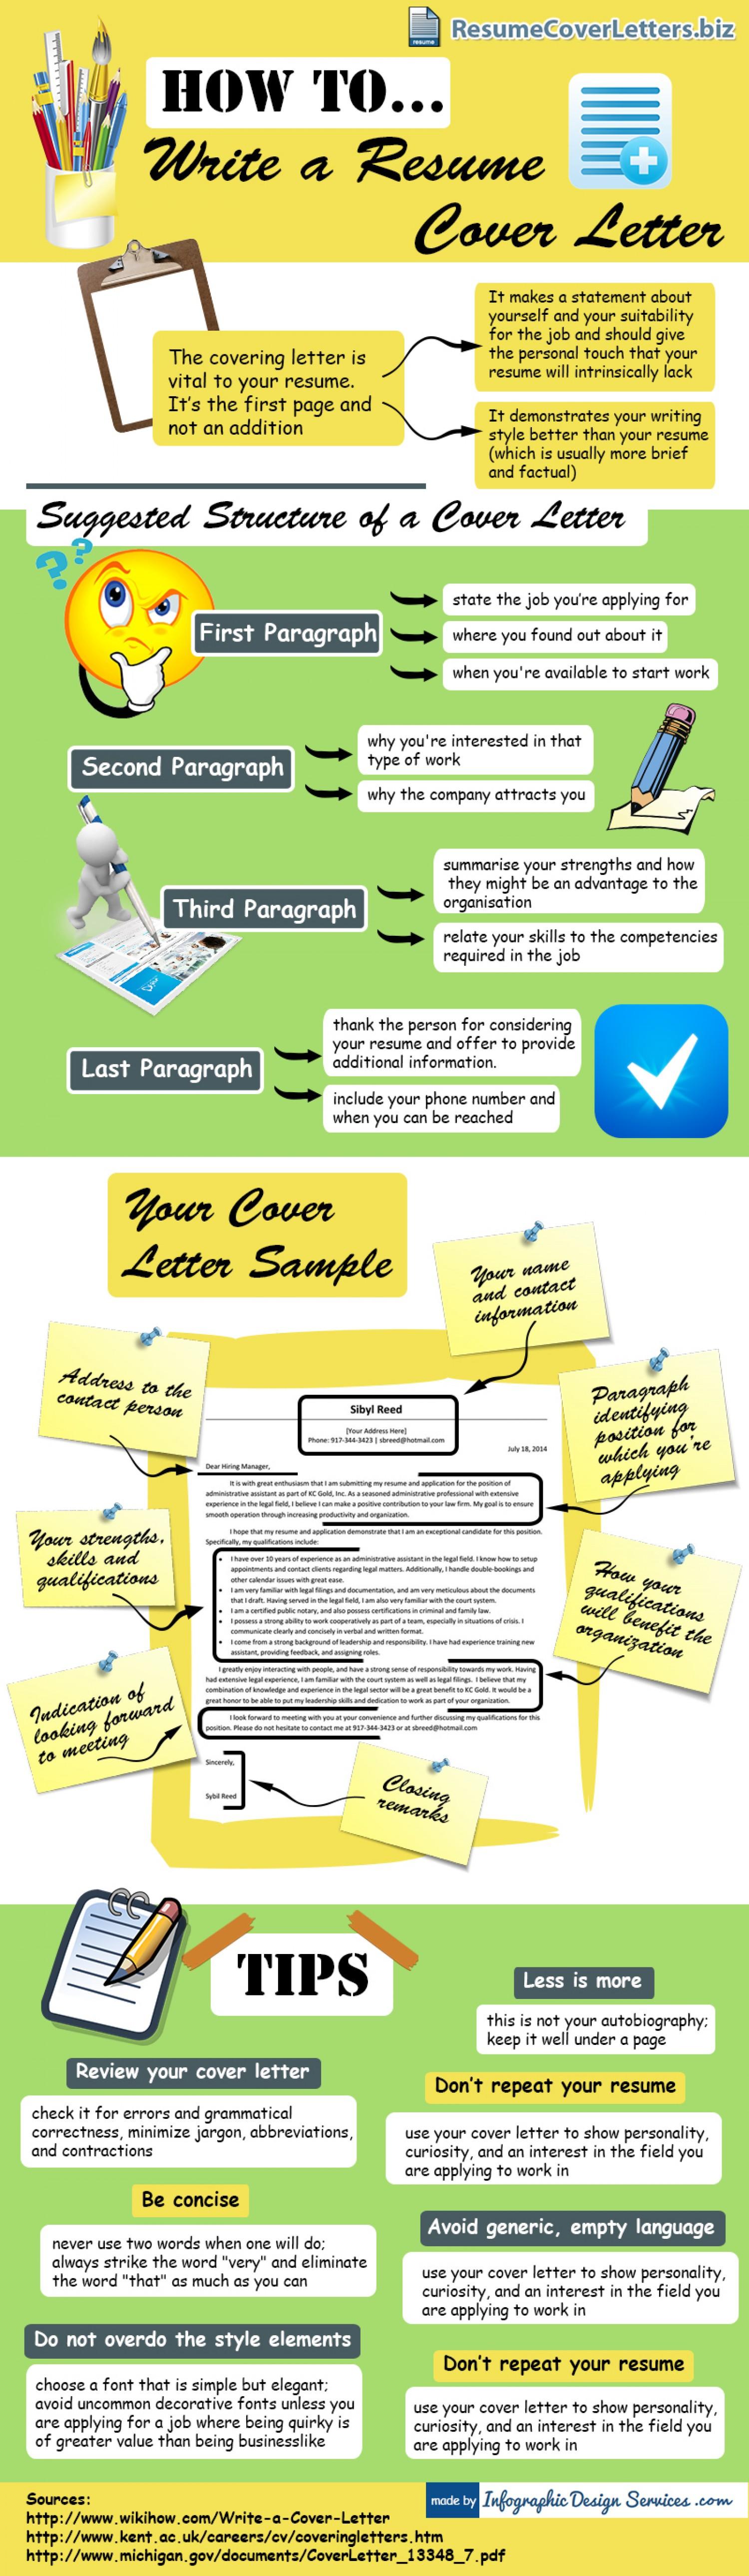 Resume Cover Letter Writing Tips Infographic  Resume Builder